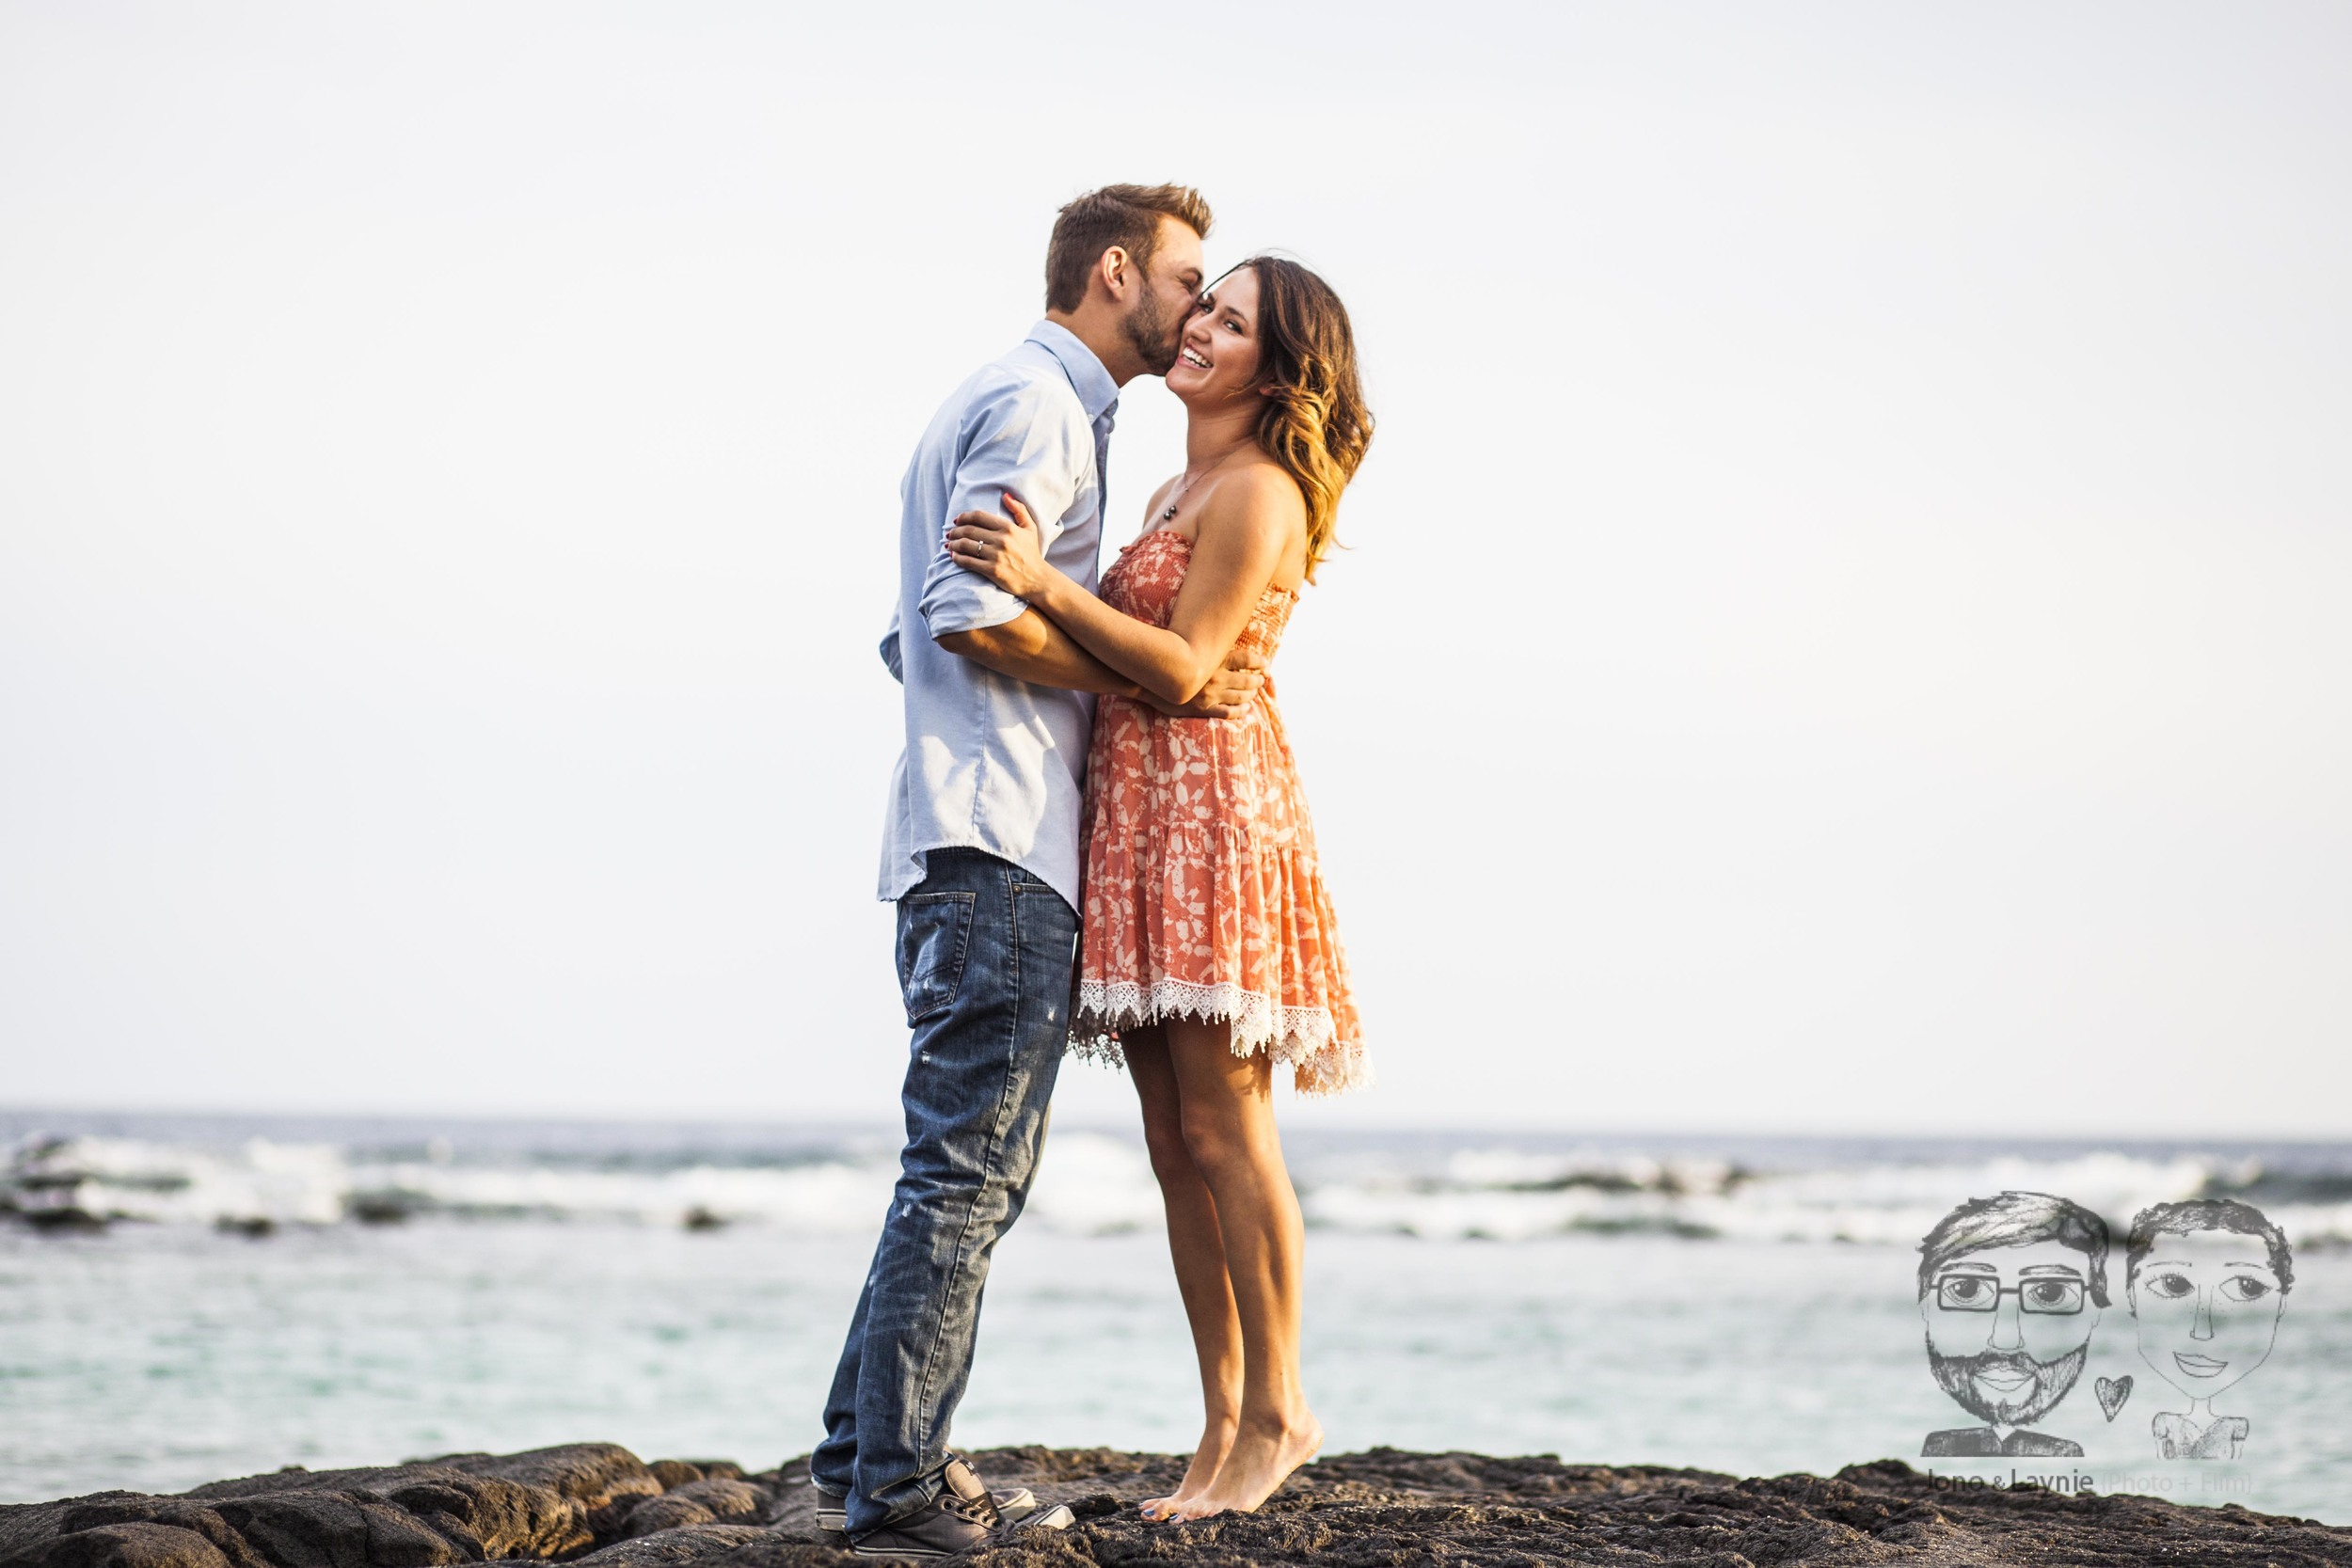 Jono & Laynie Co.-Kona, Hawaii-Engagement Session22.jpg